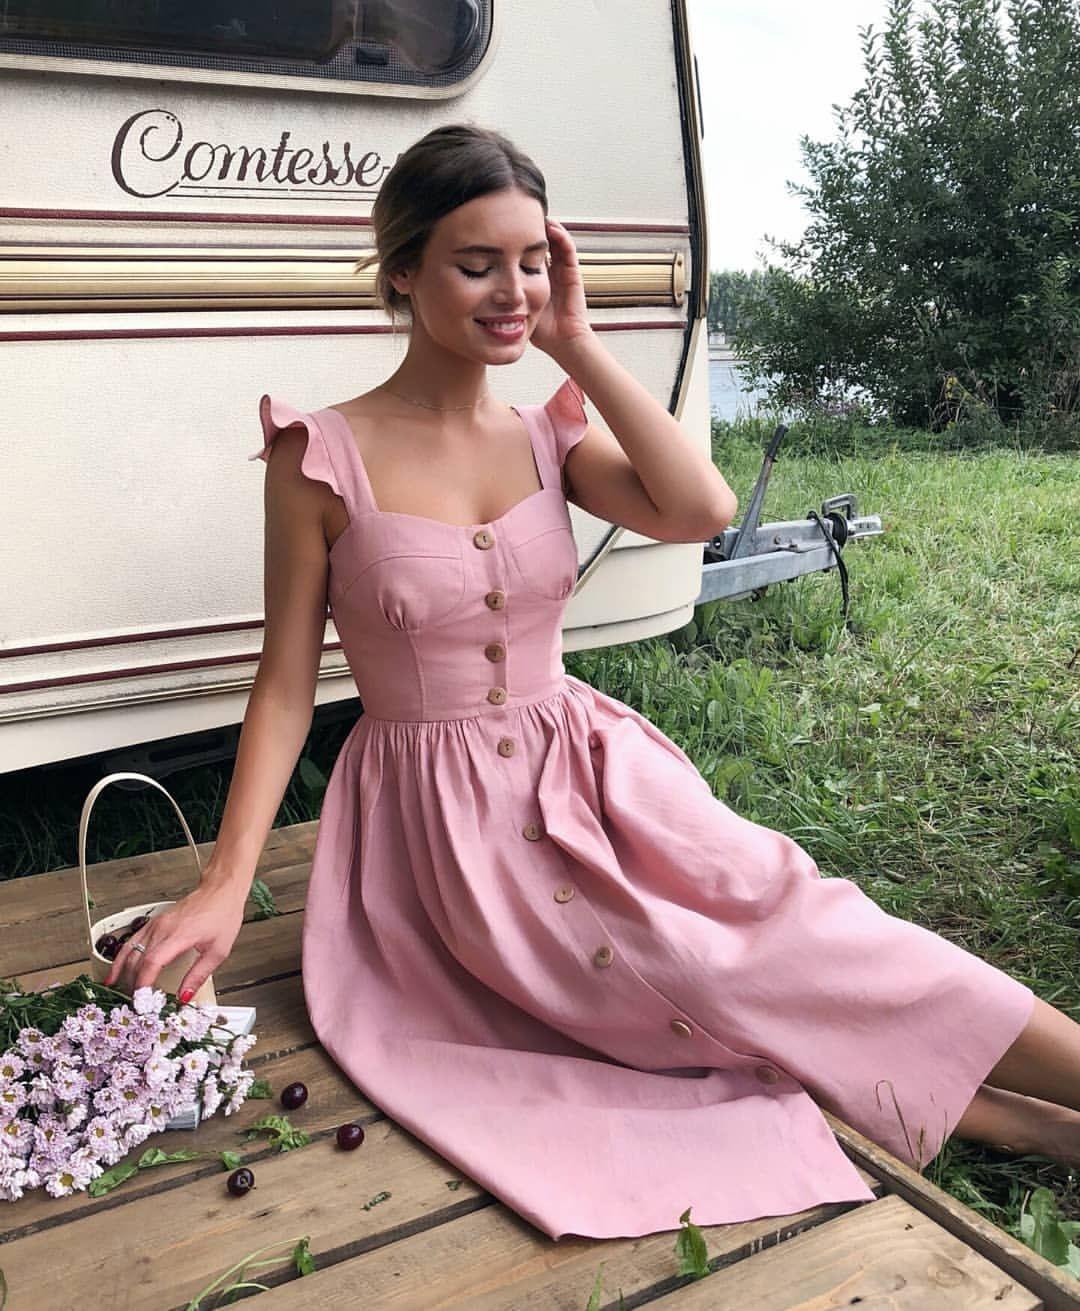 30 day wardrobe challenge by marid